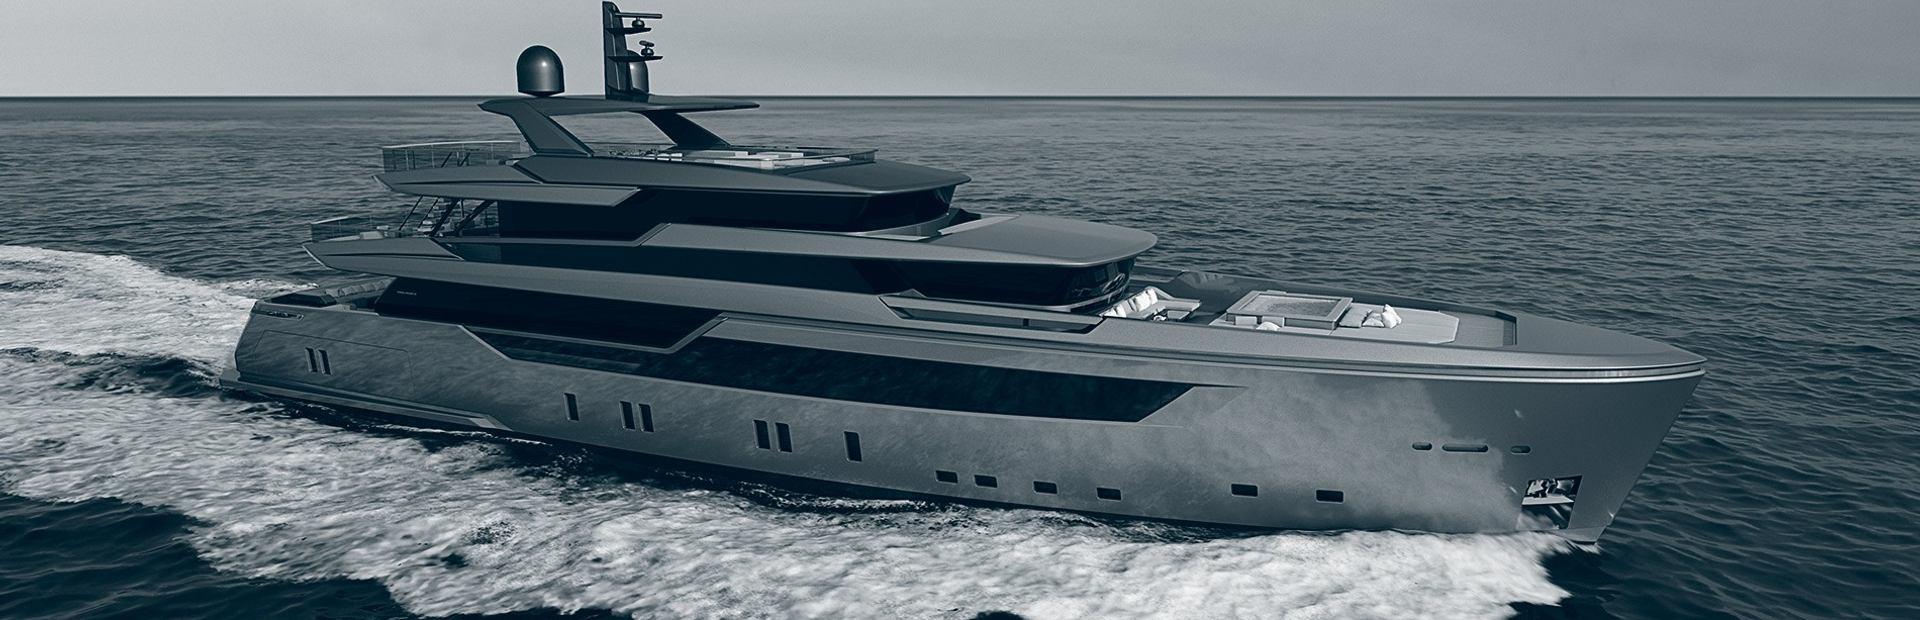 44Alloy E-Motion Yacht Charter